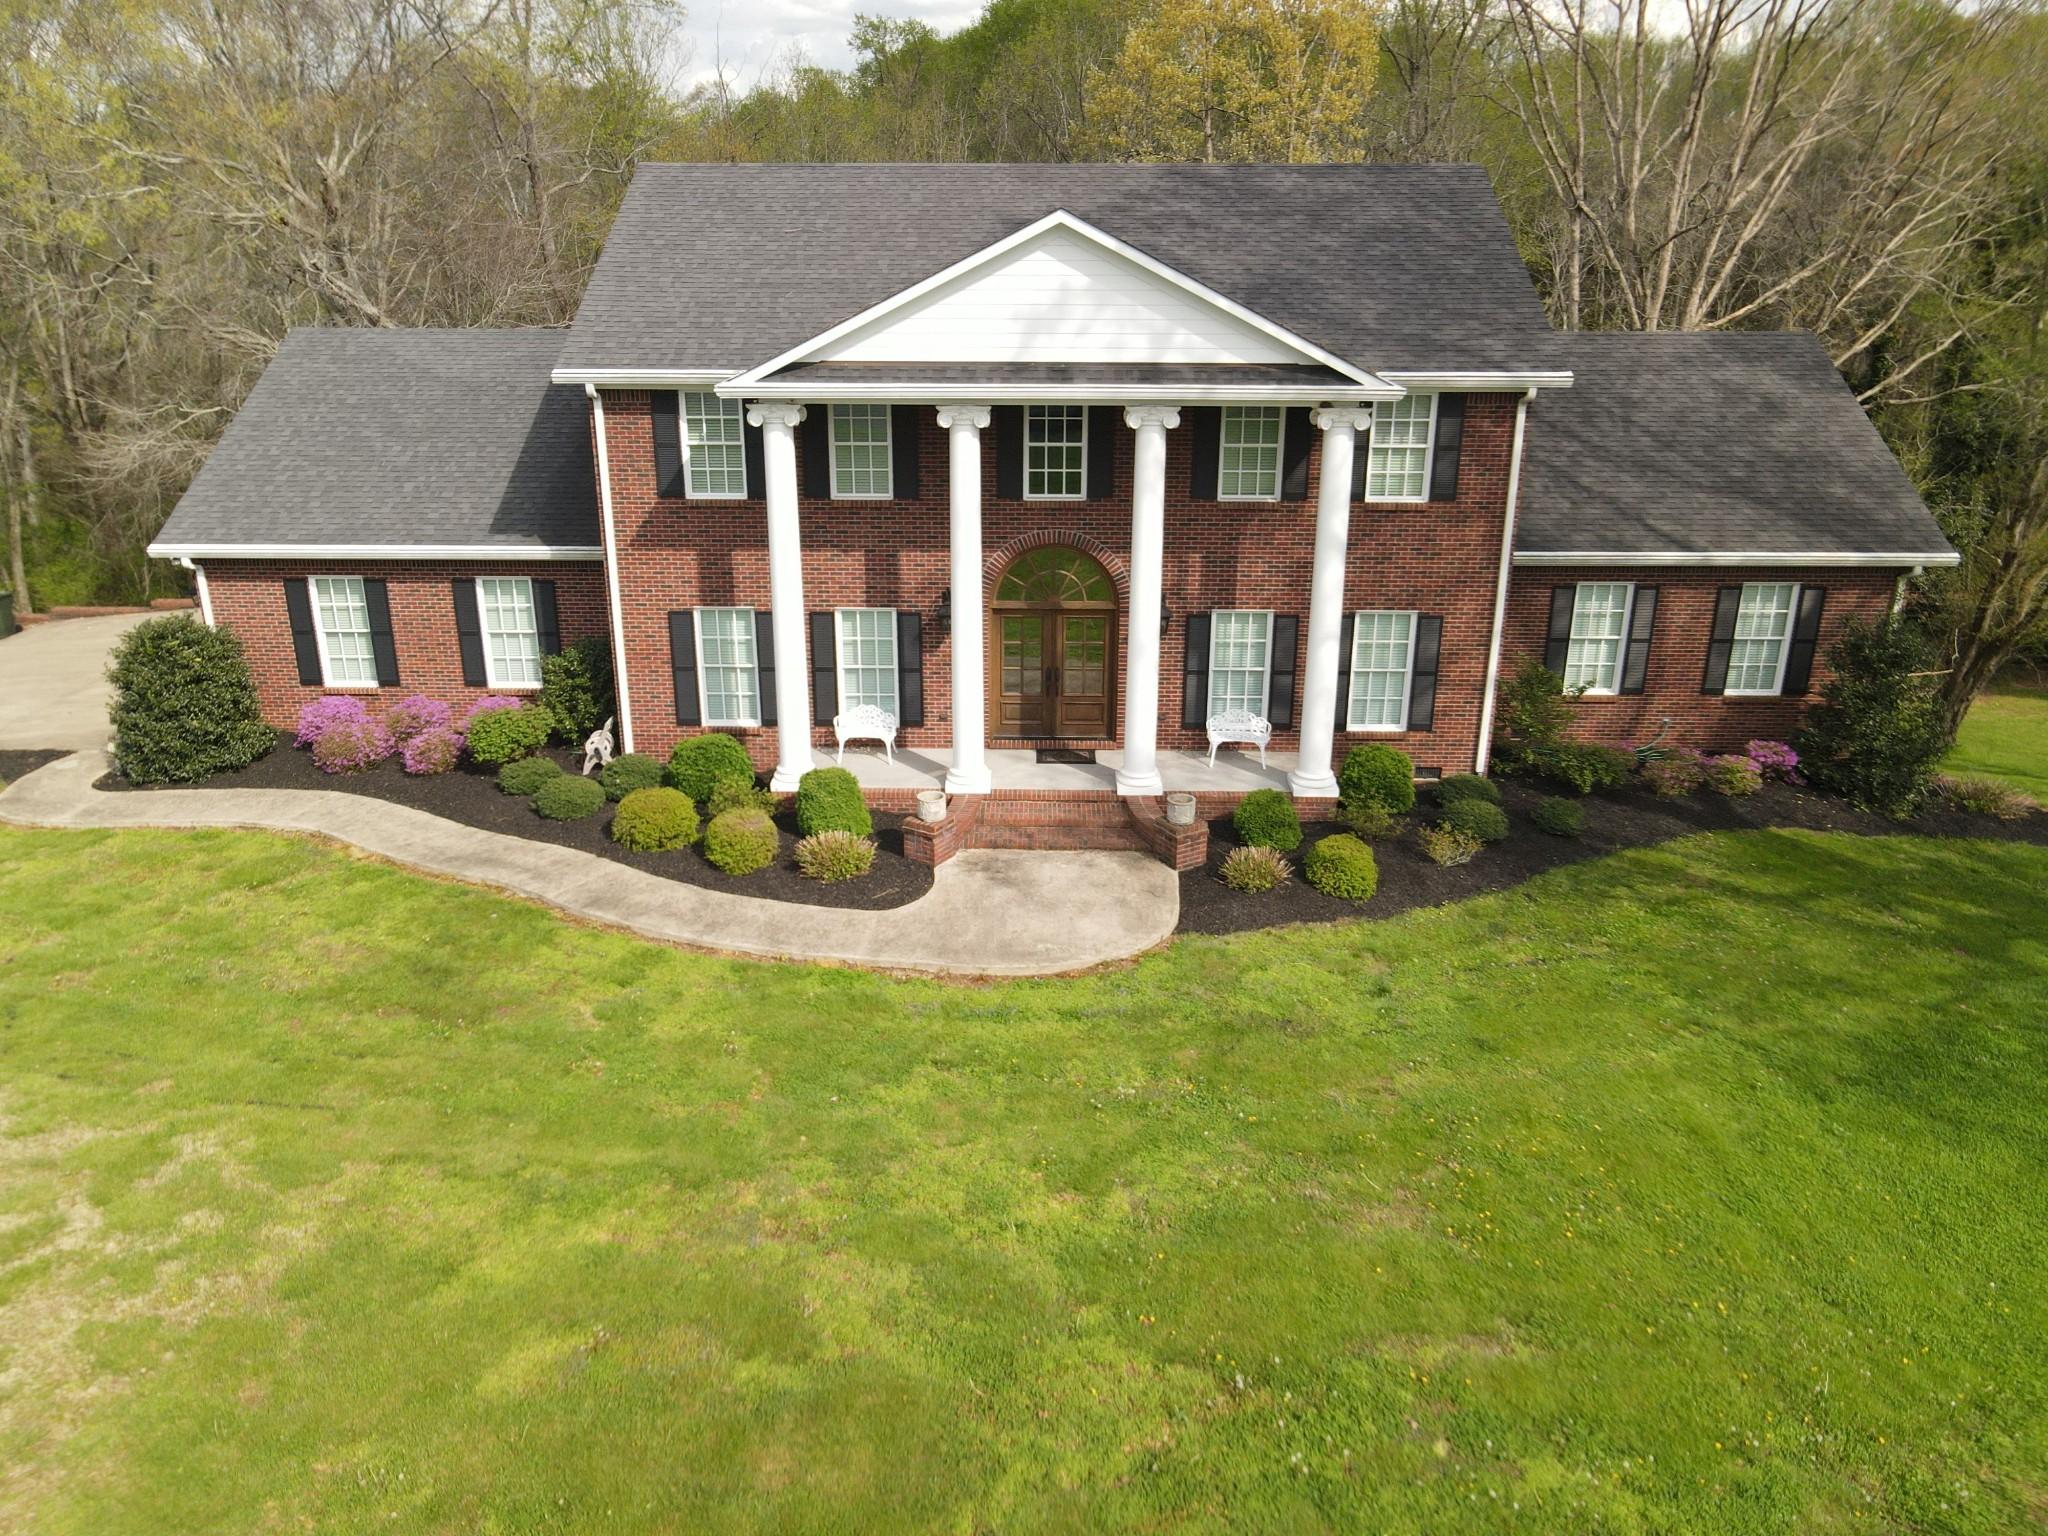 1192 Austin Cir Property Photo - Lawrenceburg, TN real estate listing